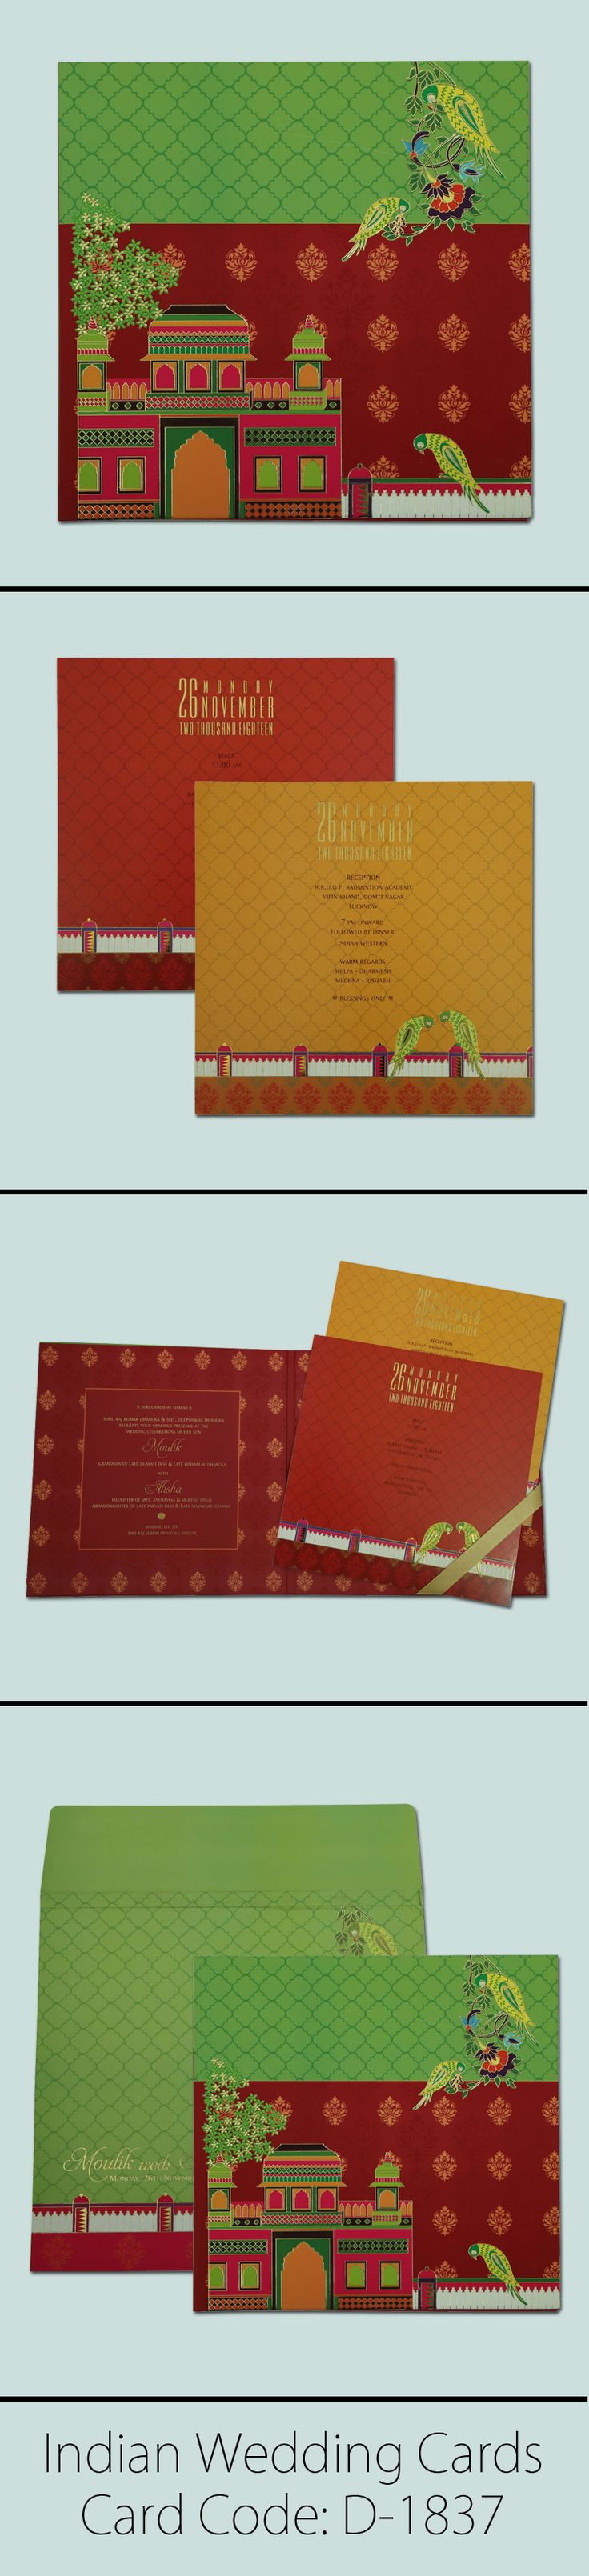 112 best Indian Wedding Cards | Indian Wedding Ideas images on Pinterest